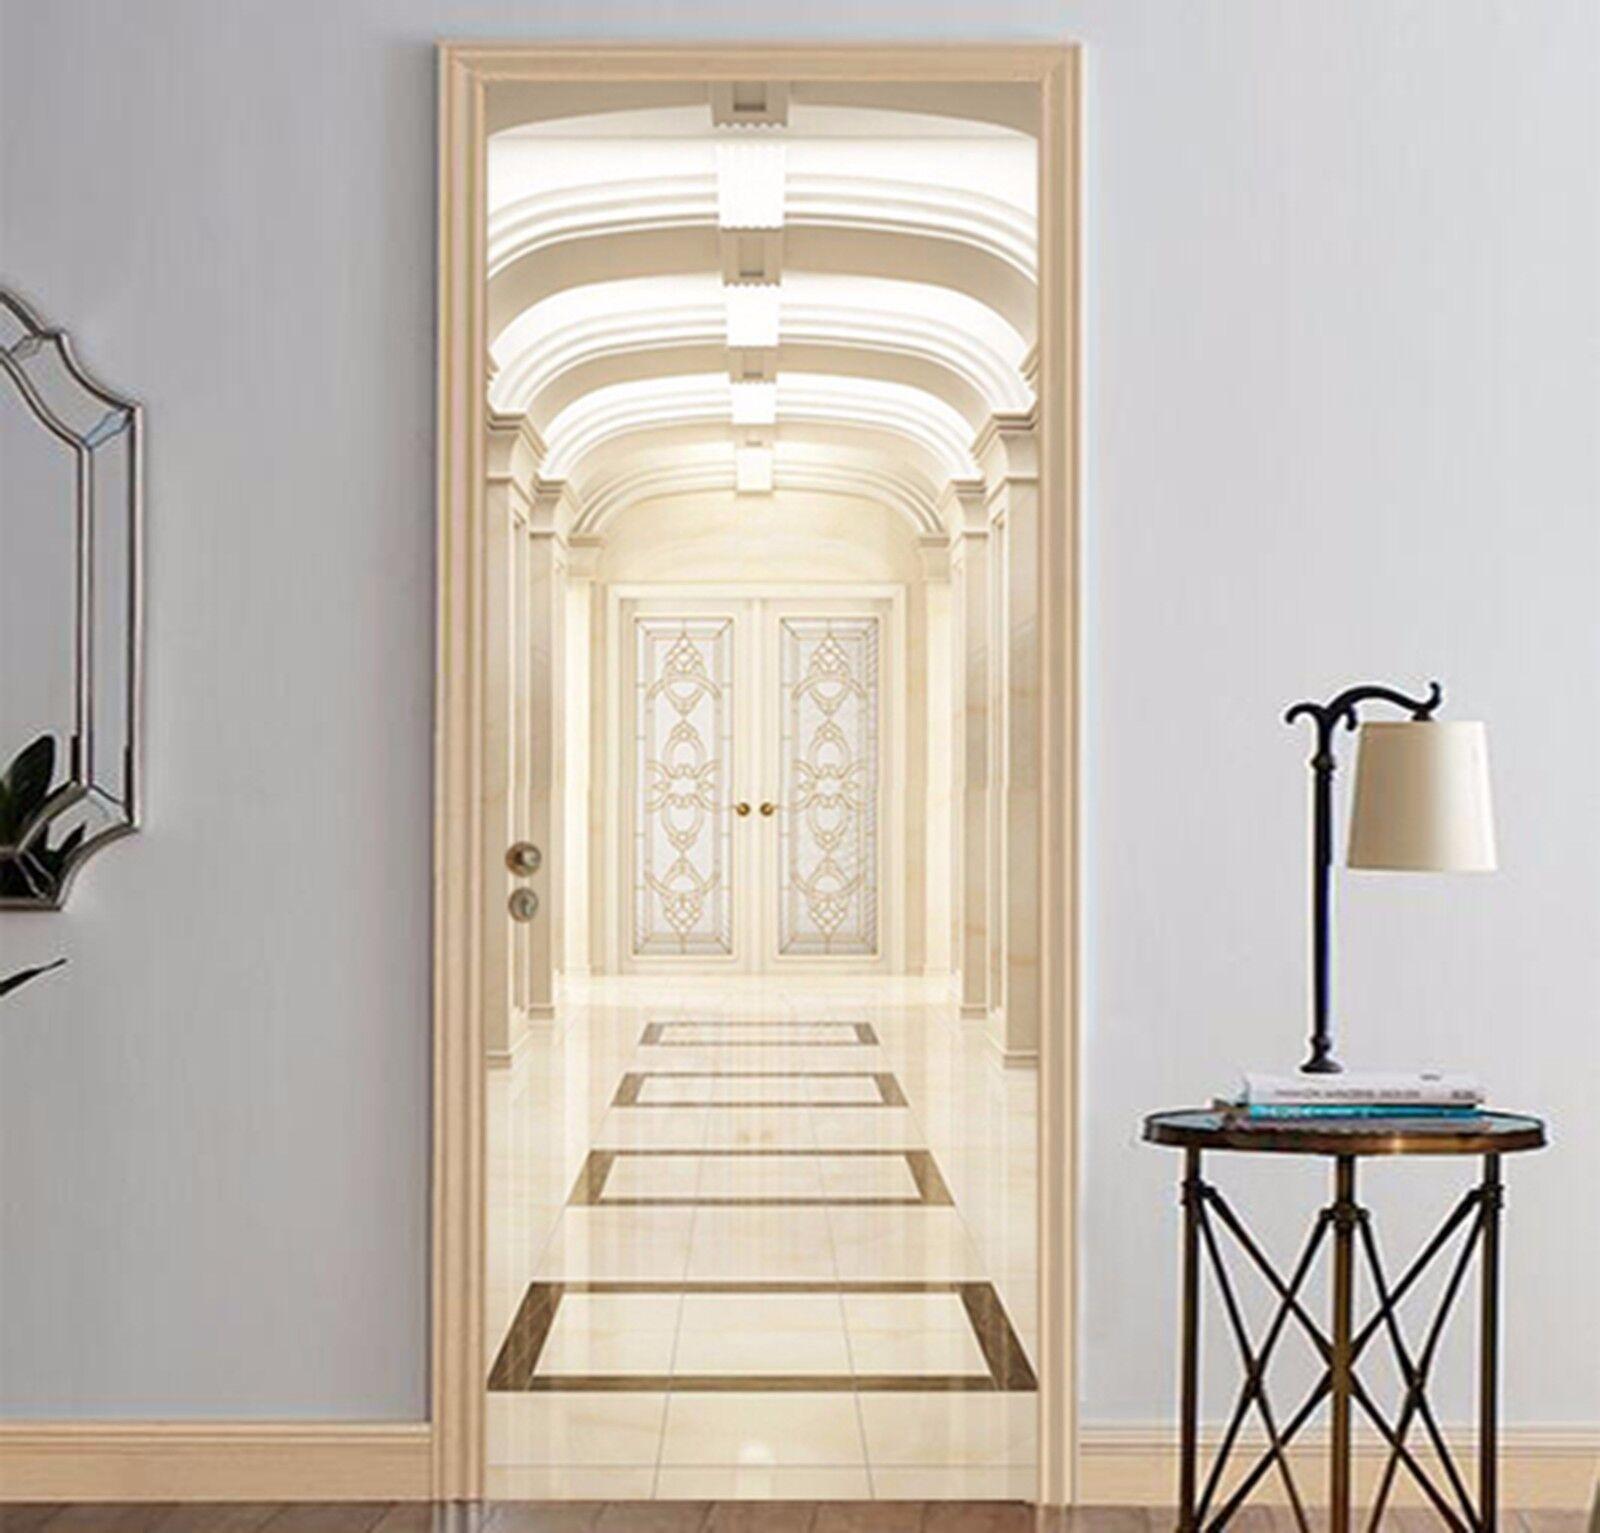 3D Weiß Gebäude 62 Tür Mauer Wandgemälde Foto Wandaufkleber AJ WALL DE Lemon